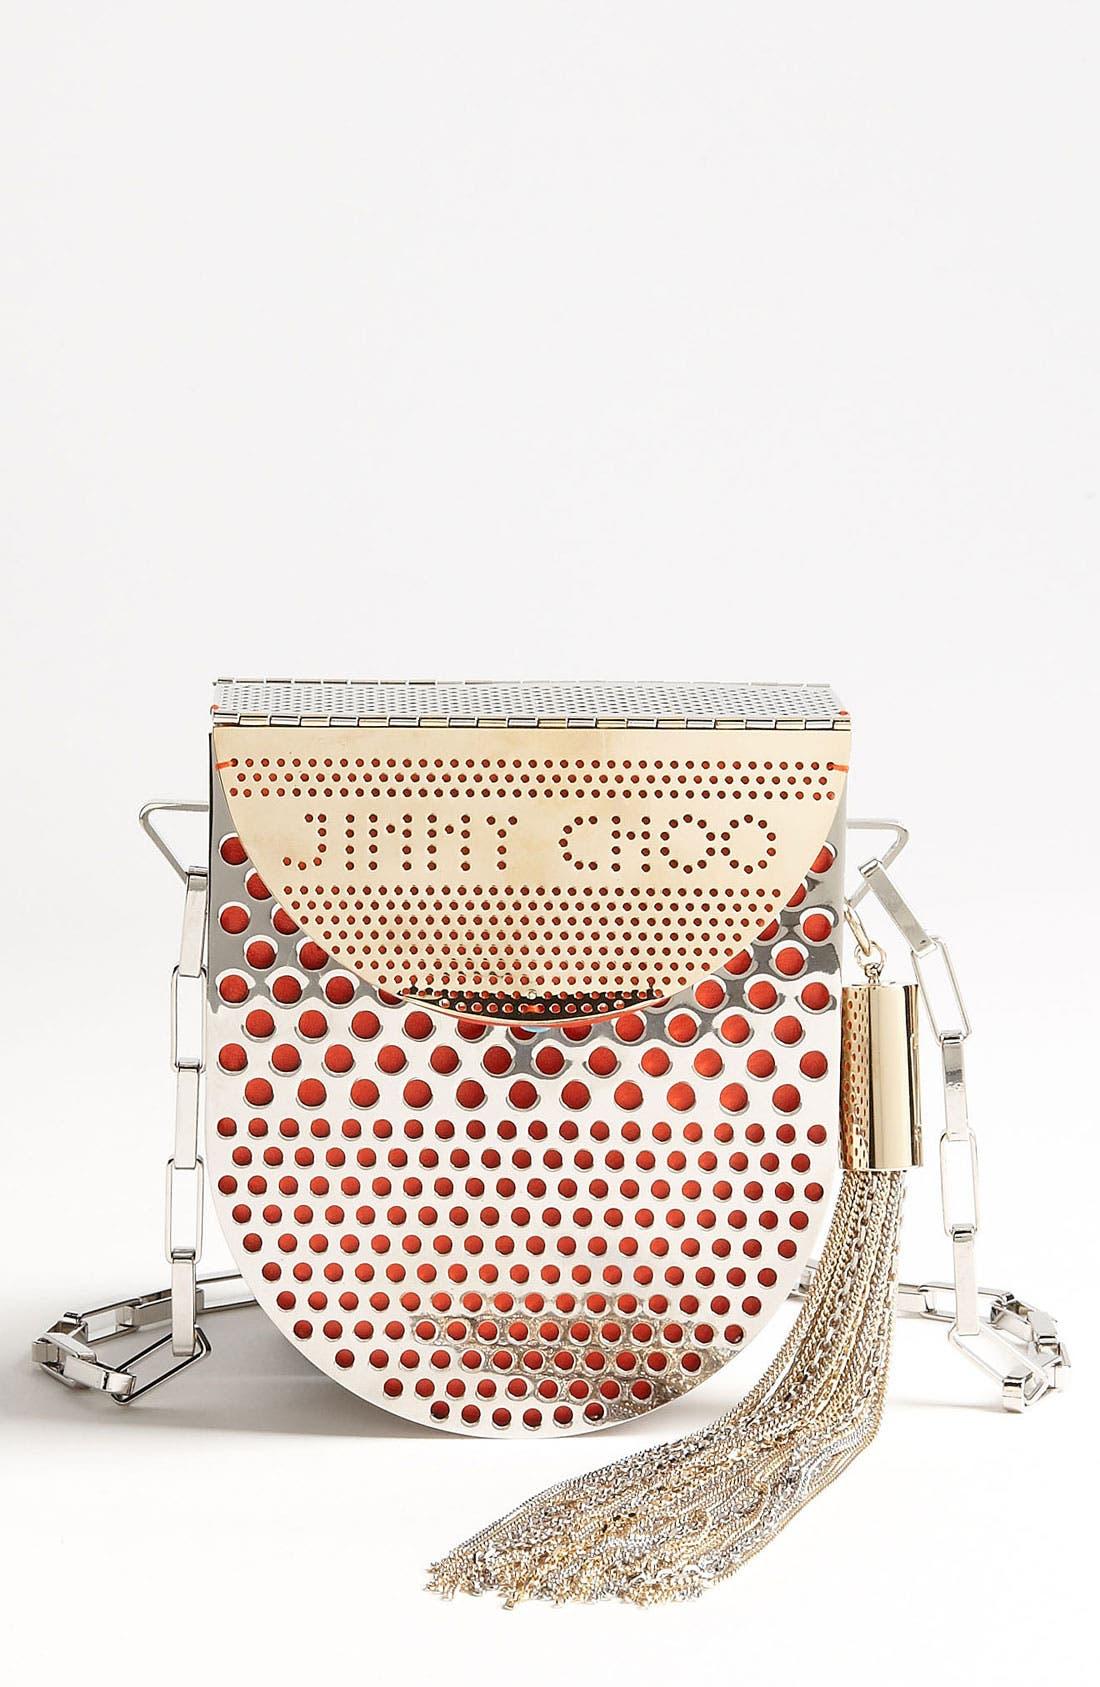 Alternate Image 1 Selected - Jimmy Choo 'Milla' Metal Crossbody Bag